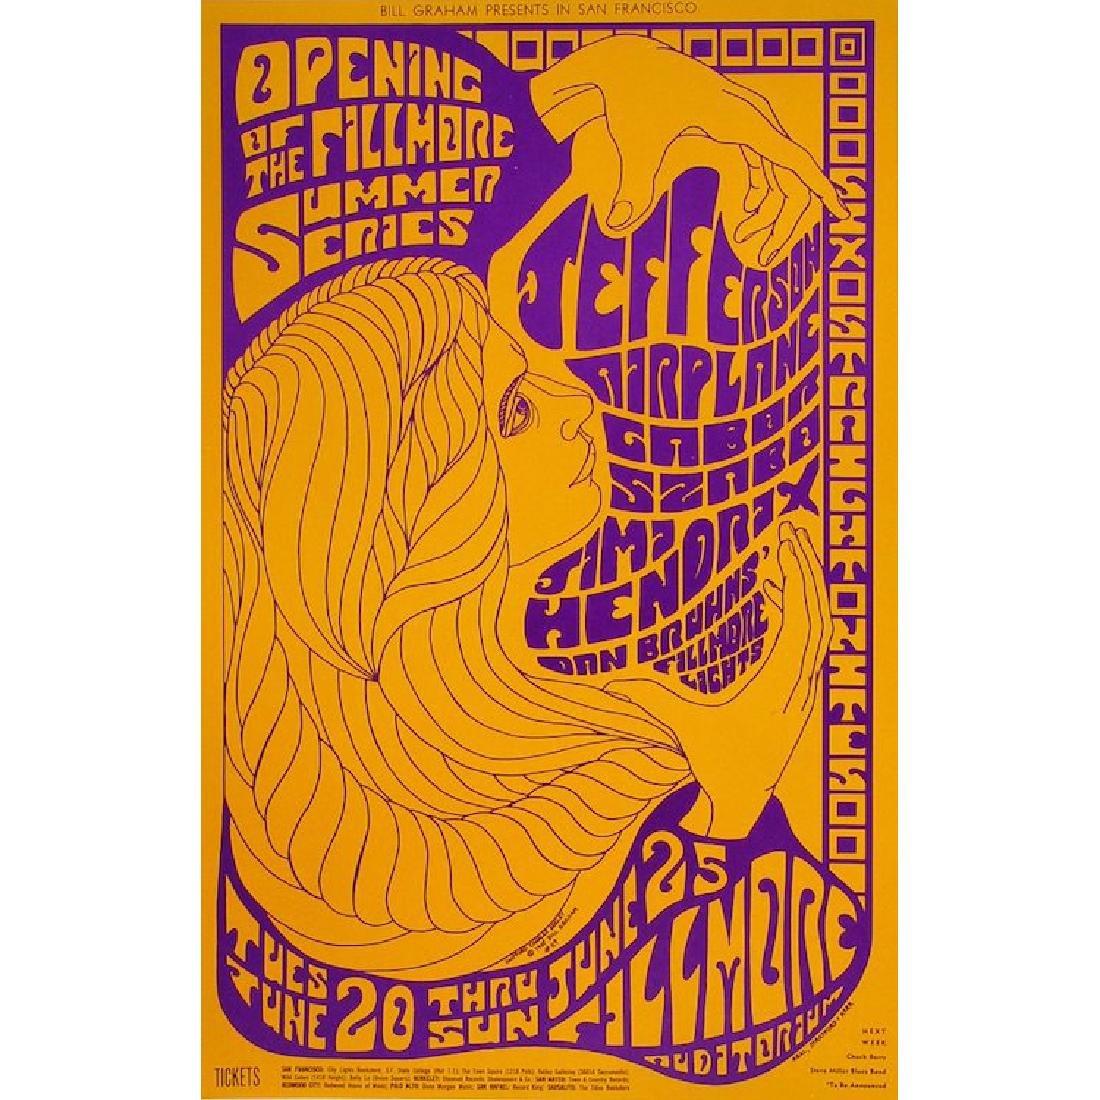 Jefferson Airplane - Jimi Hendrix - 1967 Concert Poster